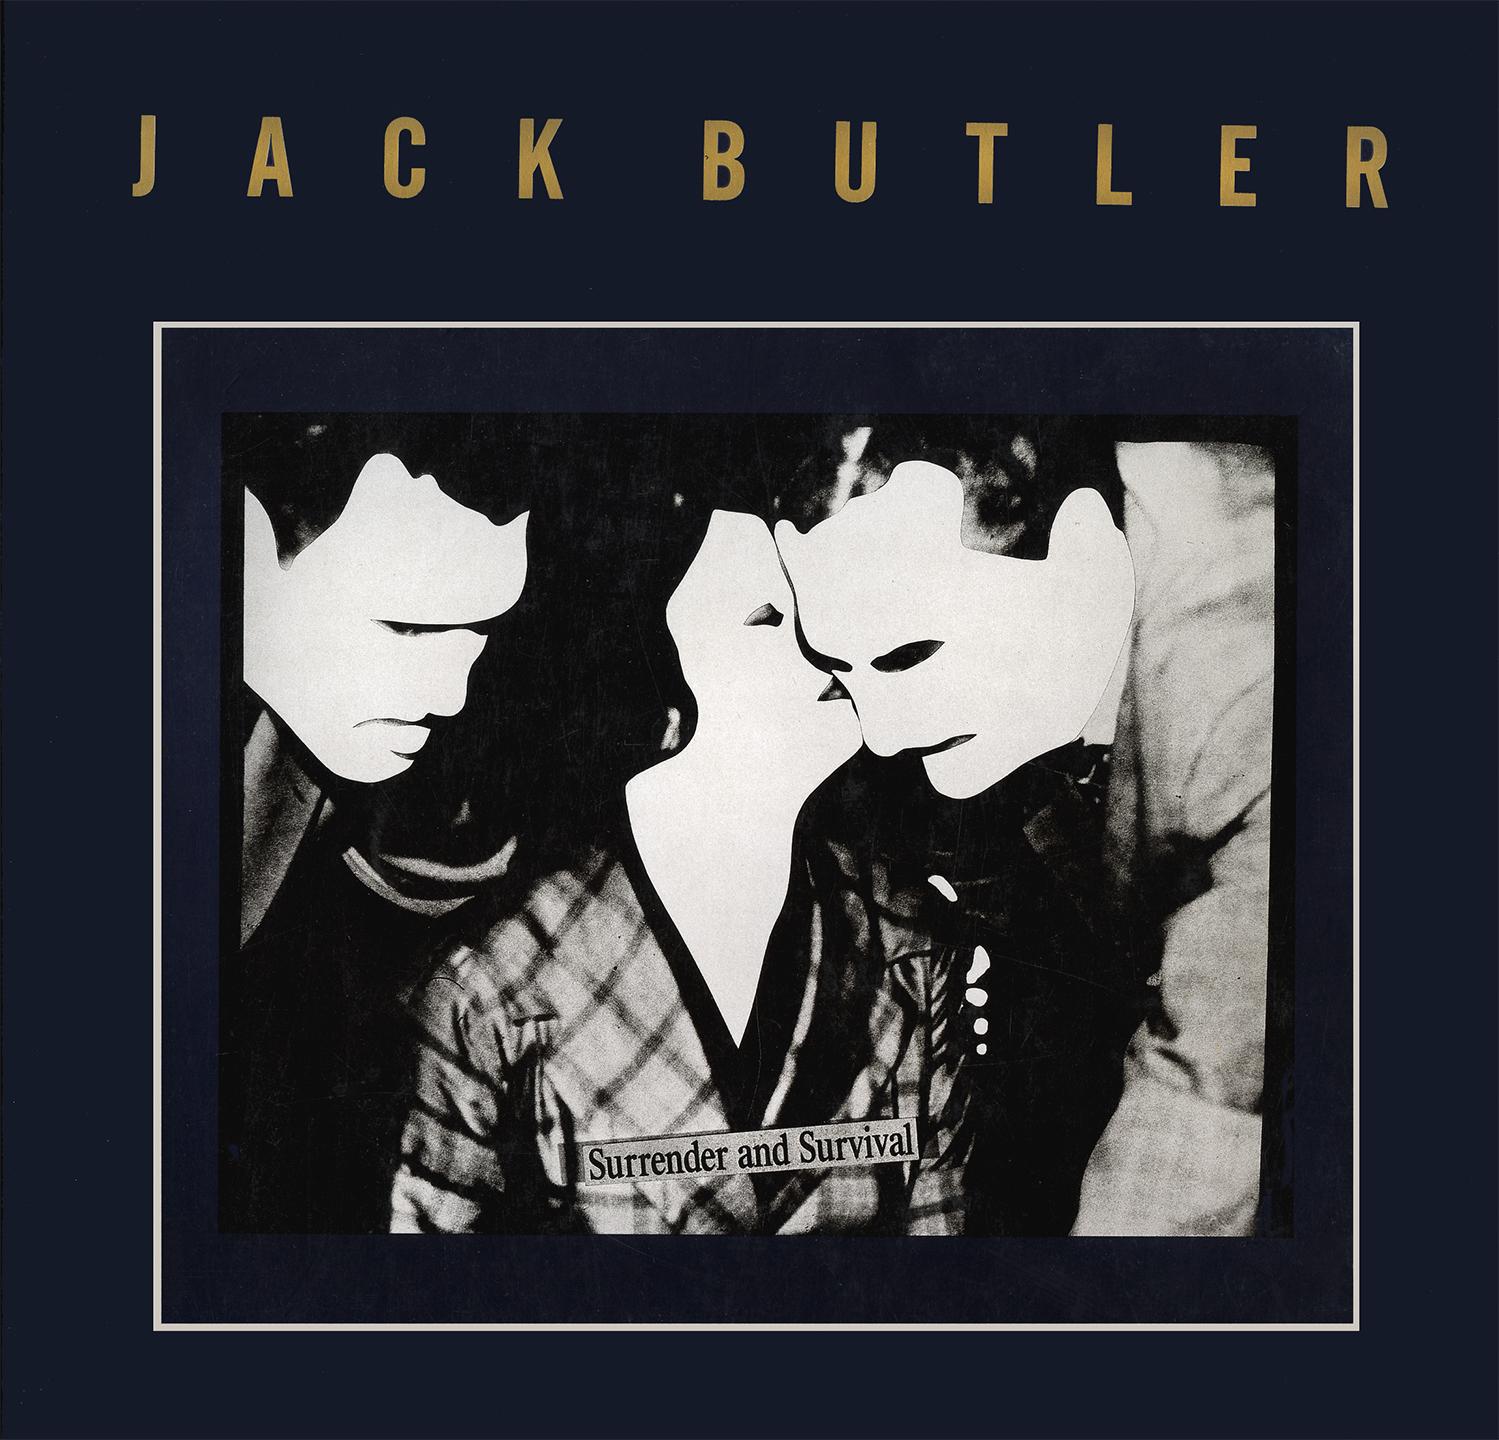 Jack Butler Min Gallery 1988